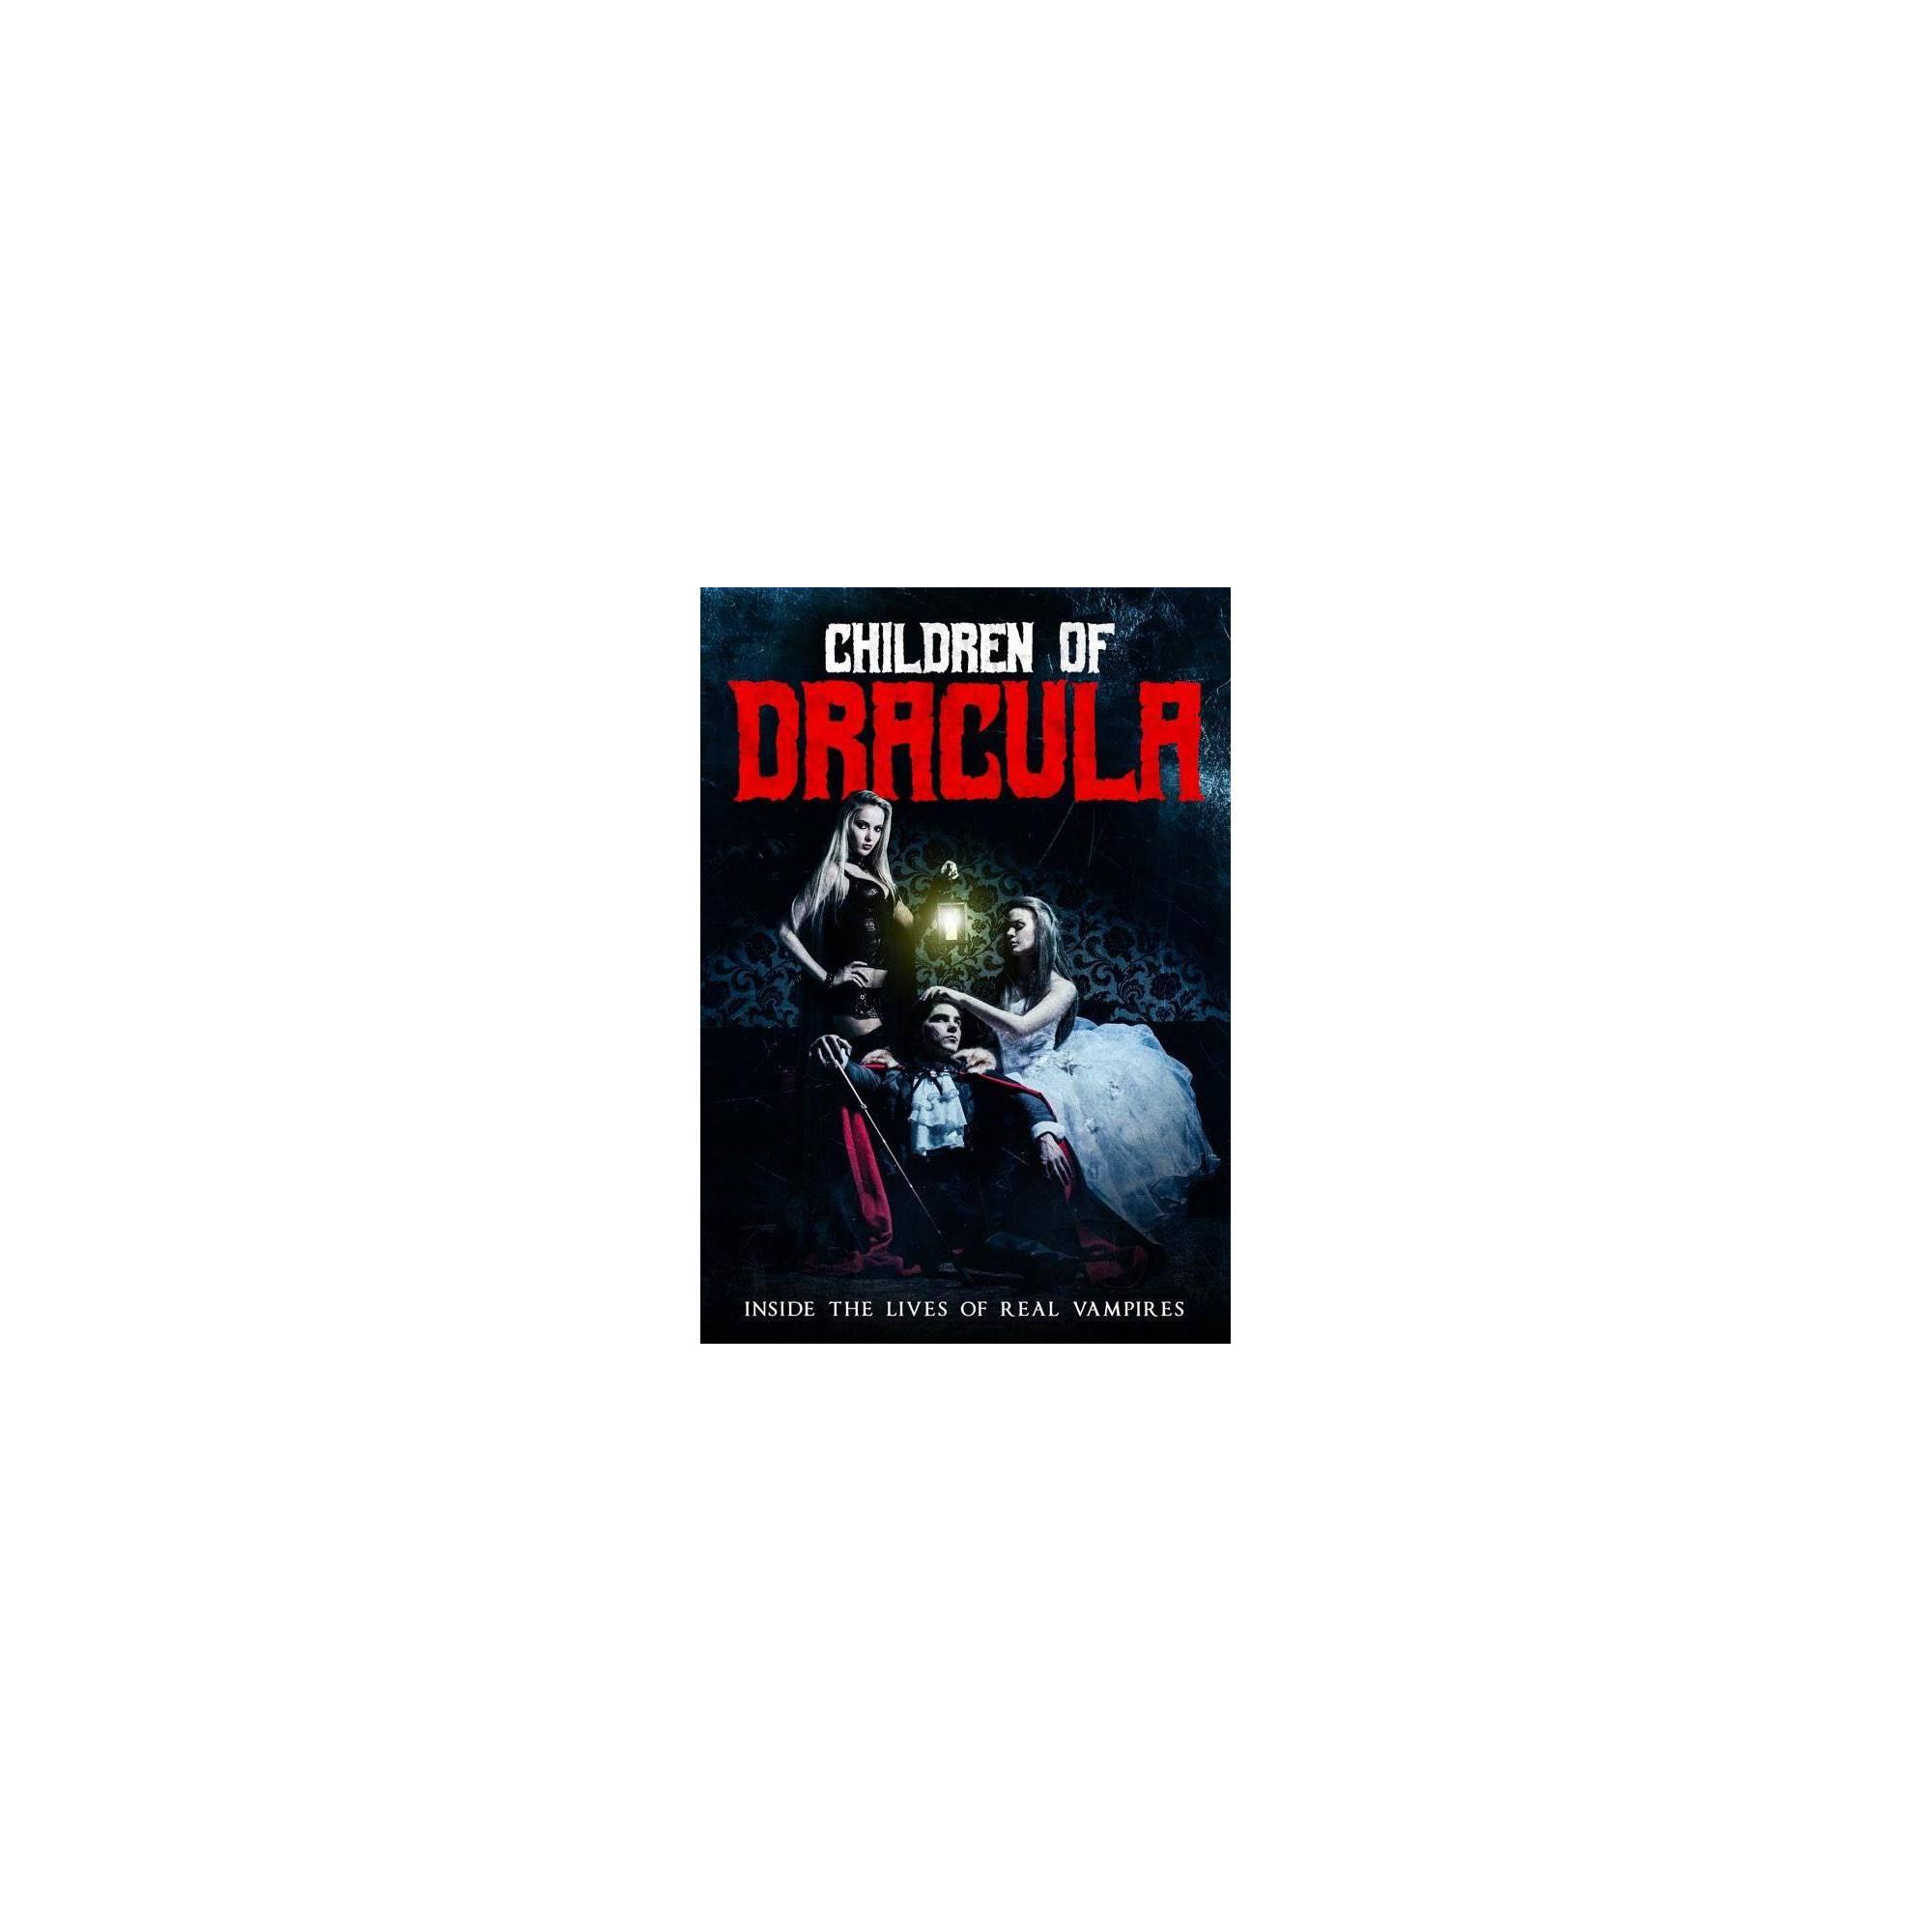 Children Of Dracula (Dvd/1994) (Dvd)